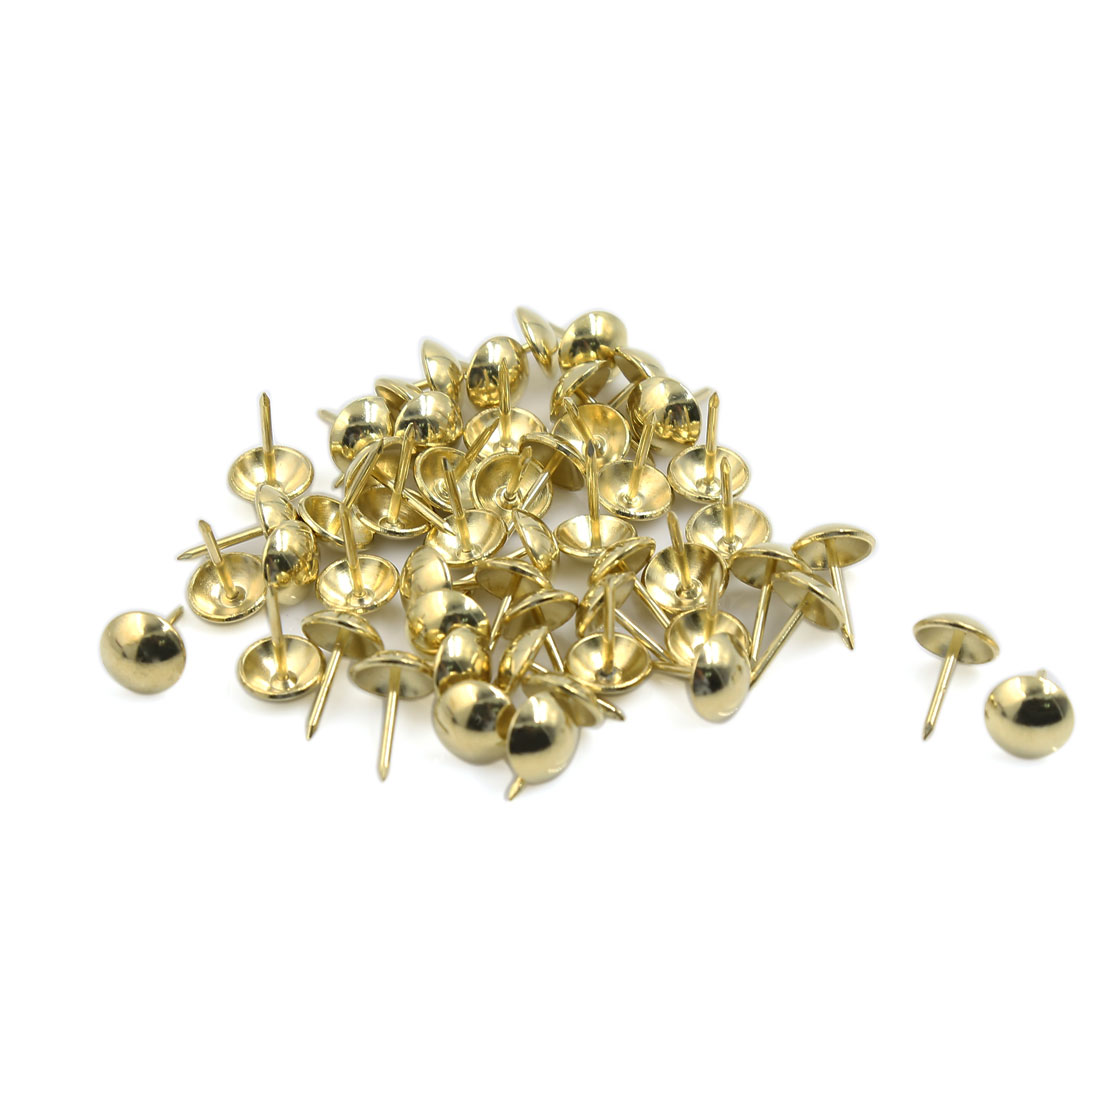 Board Corkboard Photo Thumb Tacks Drawing Pins Gold Tone 11mm Dia 50 Pcs